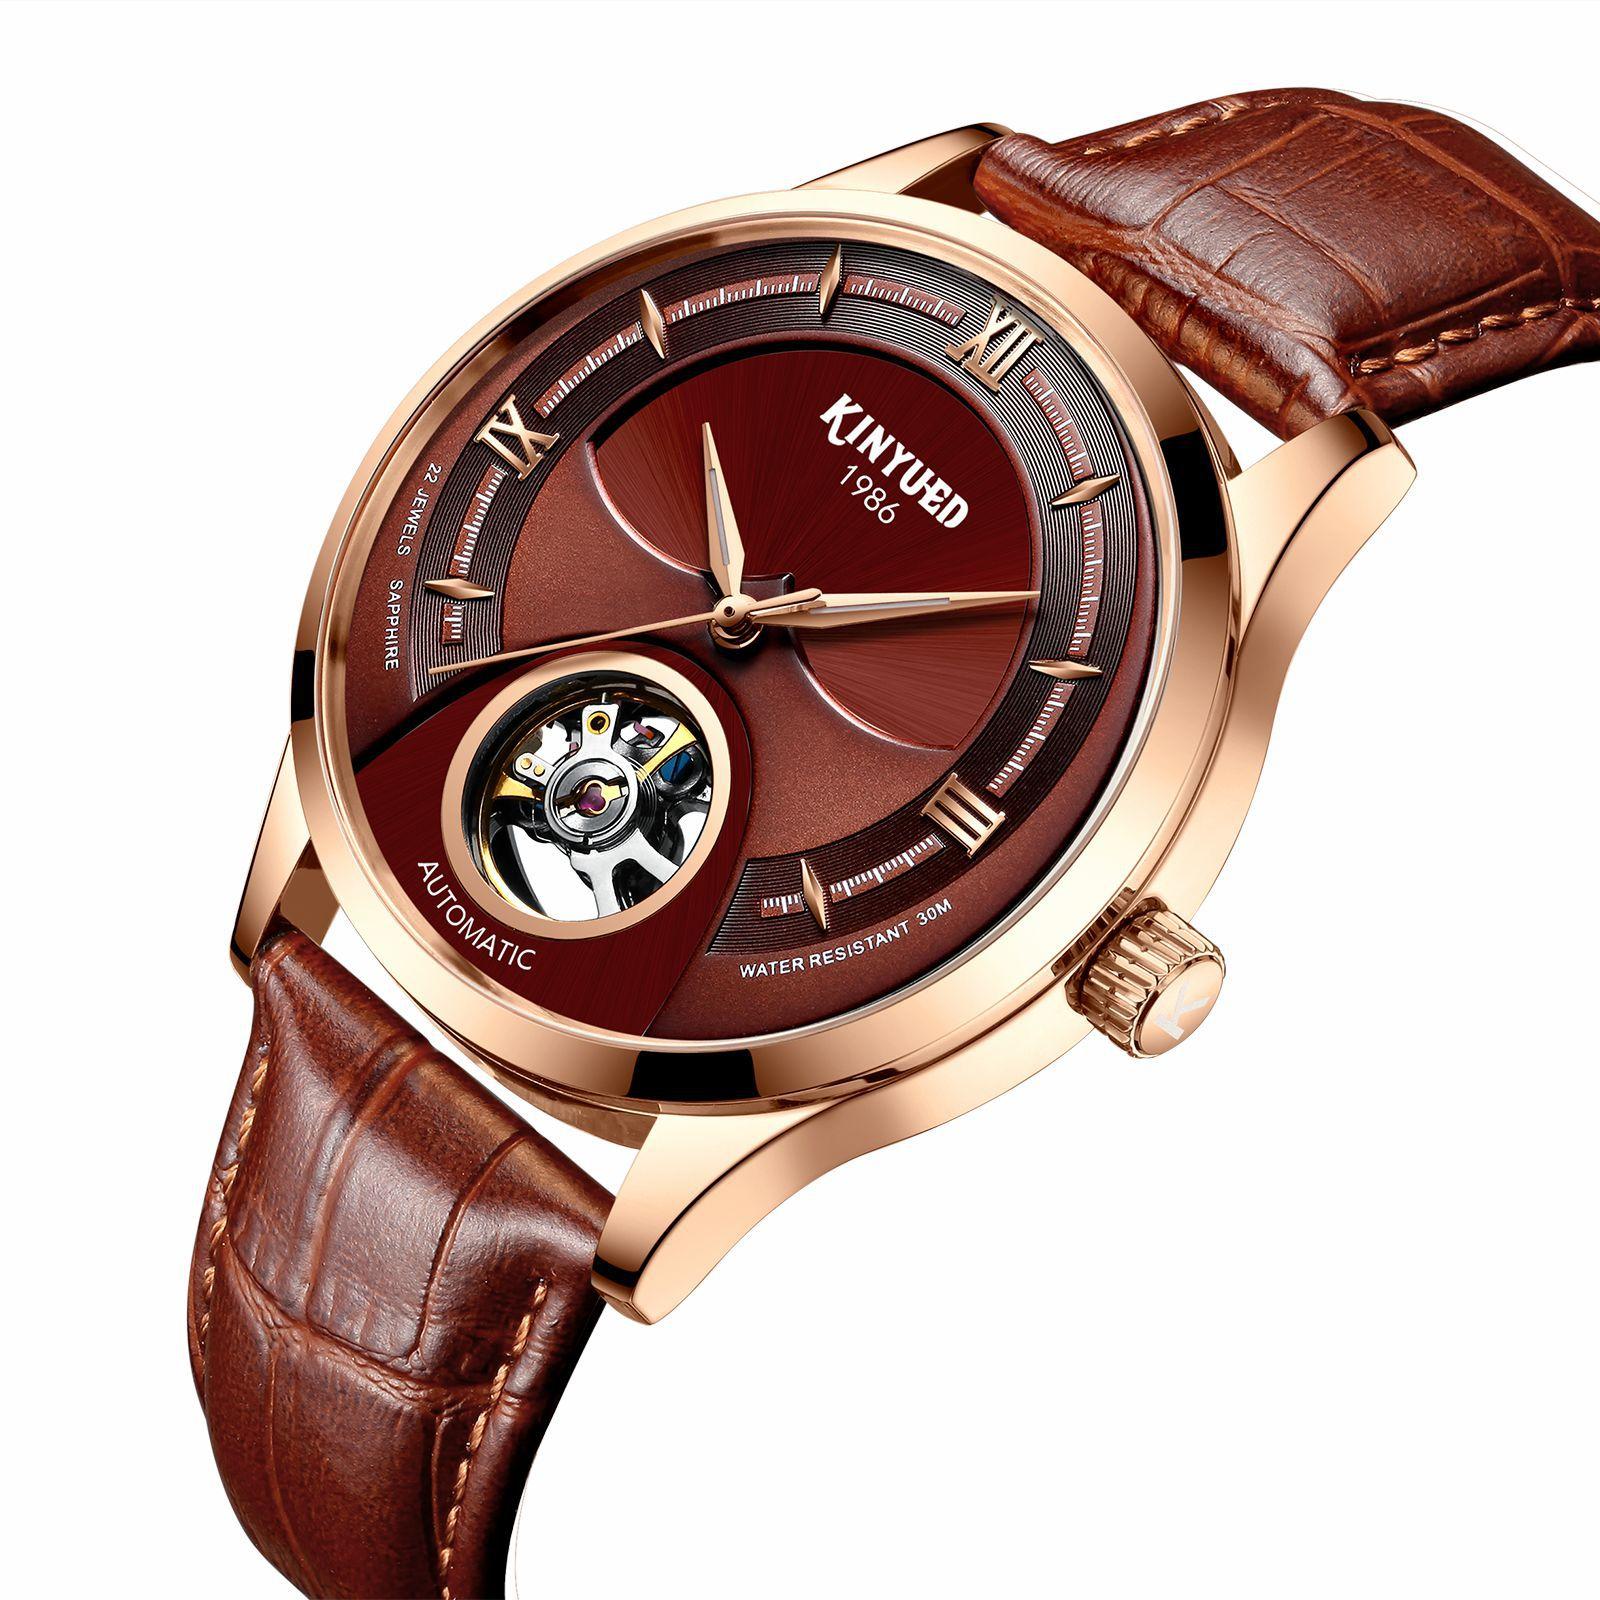 Novo kinyued relógio de couro masculino 44 diâmetro